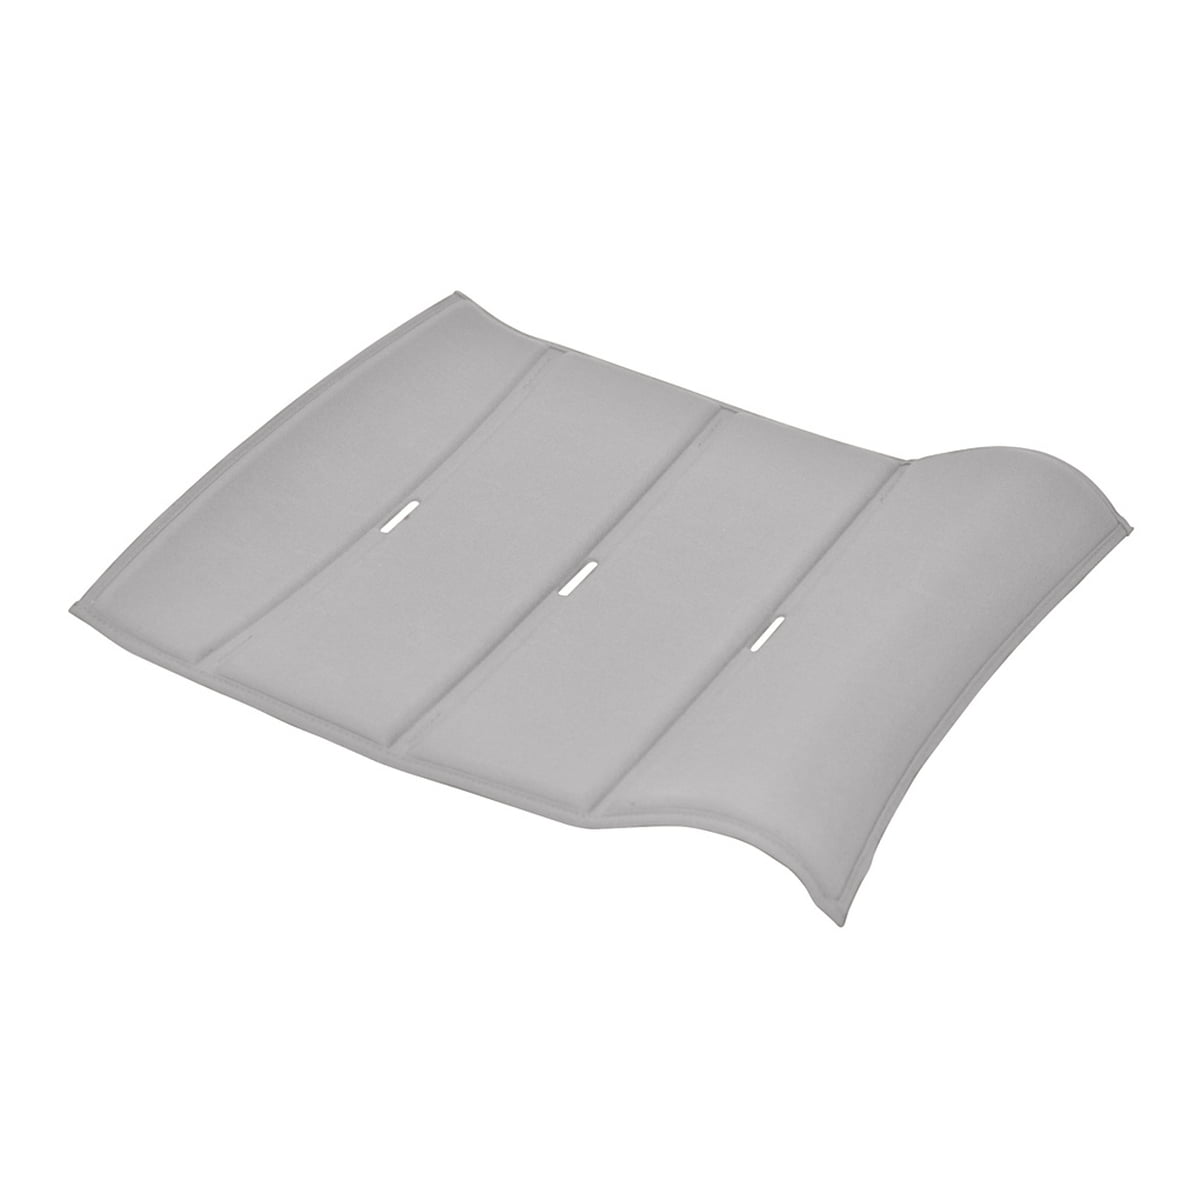 Fermob - Outdoor-Kissen Skin, 45 x 40 cm, grau | Garten > Gartenmöbel > Outdoor-Sitzsäcke | Grau | fermob